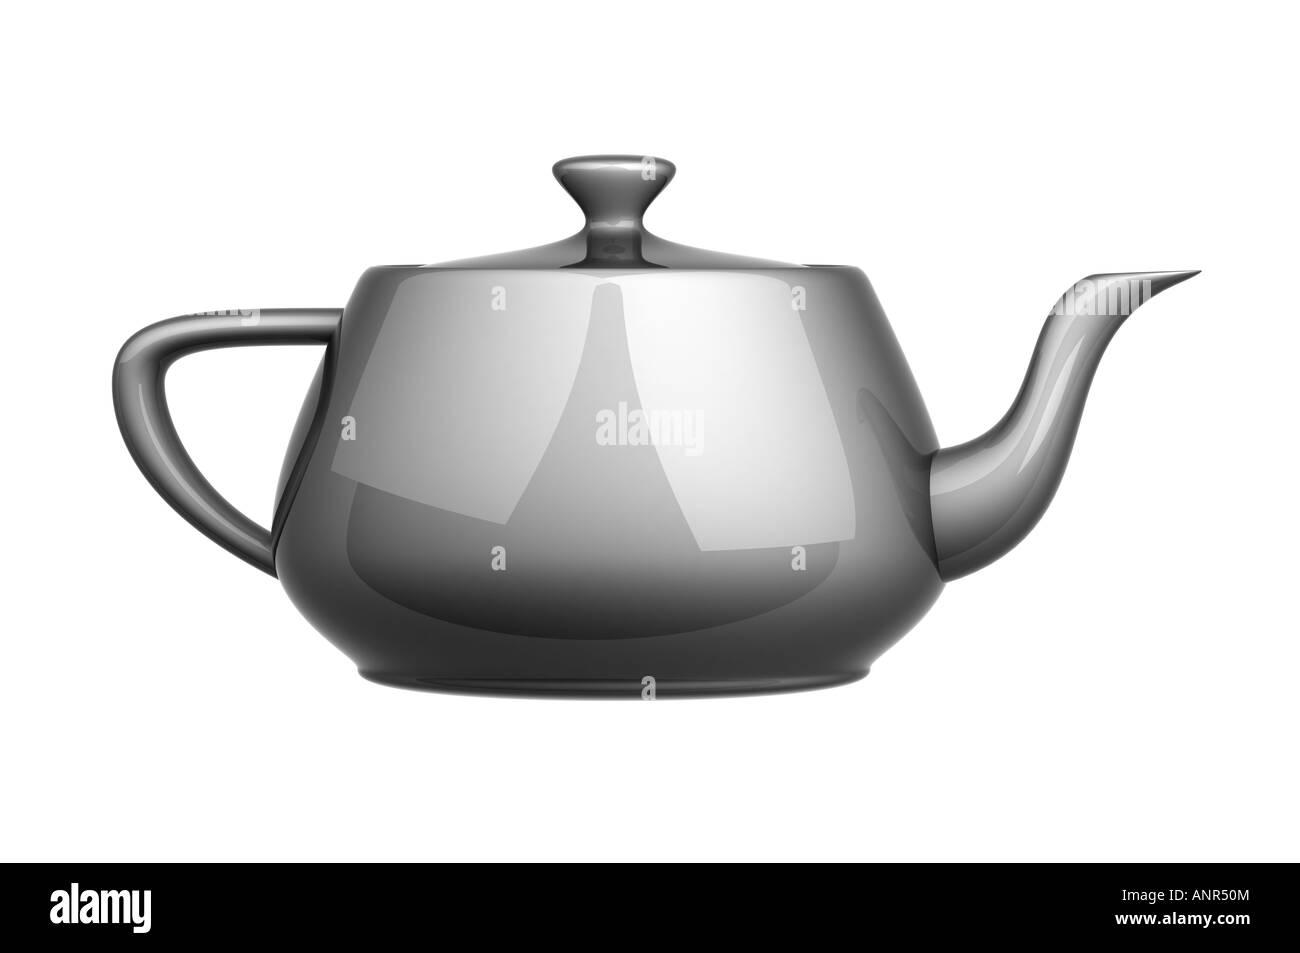 Tea pot kettle - Stock Image